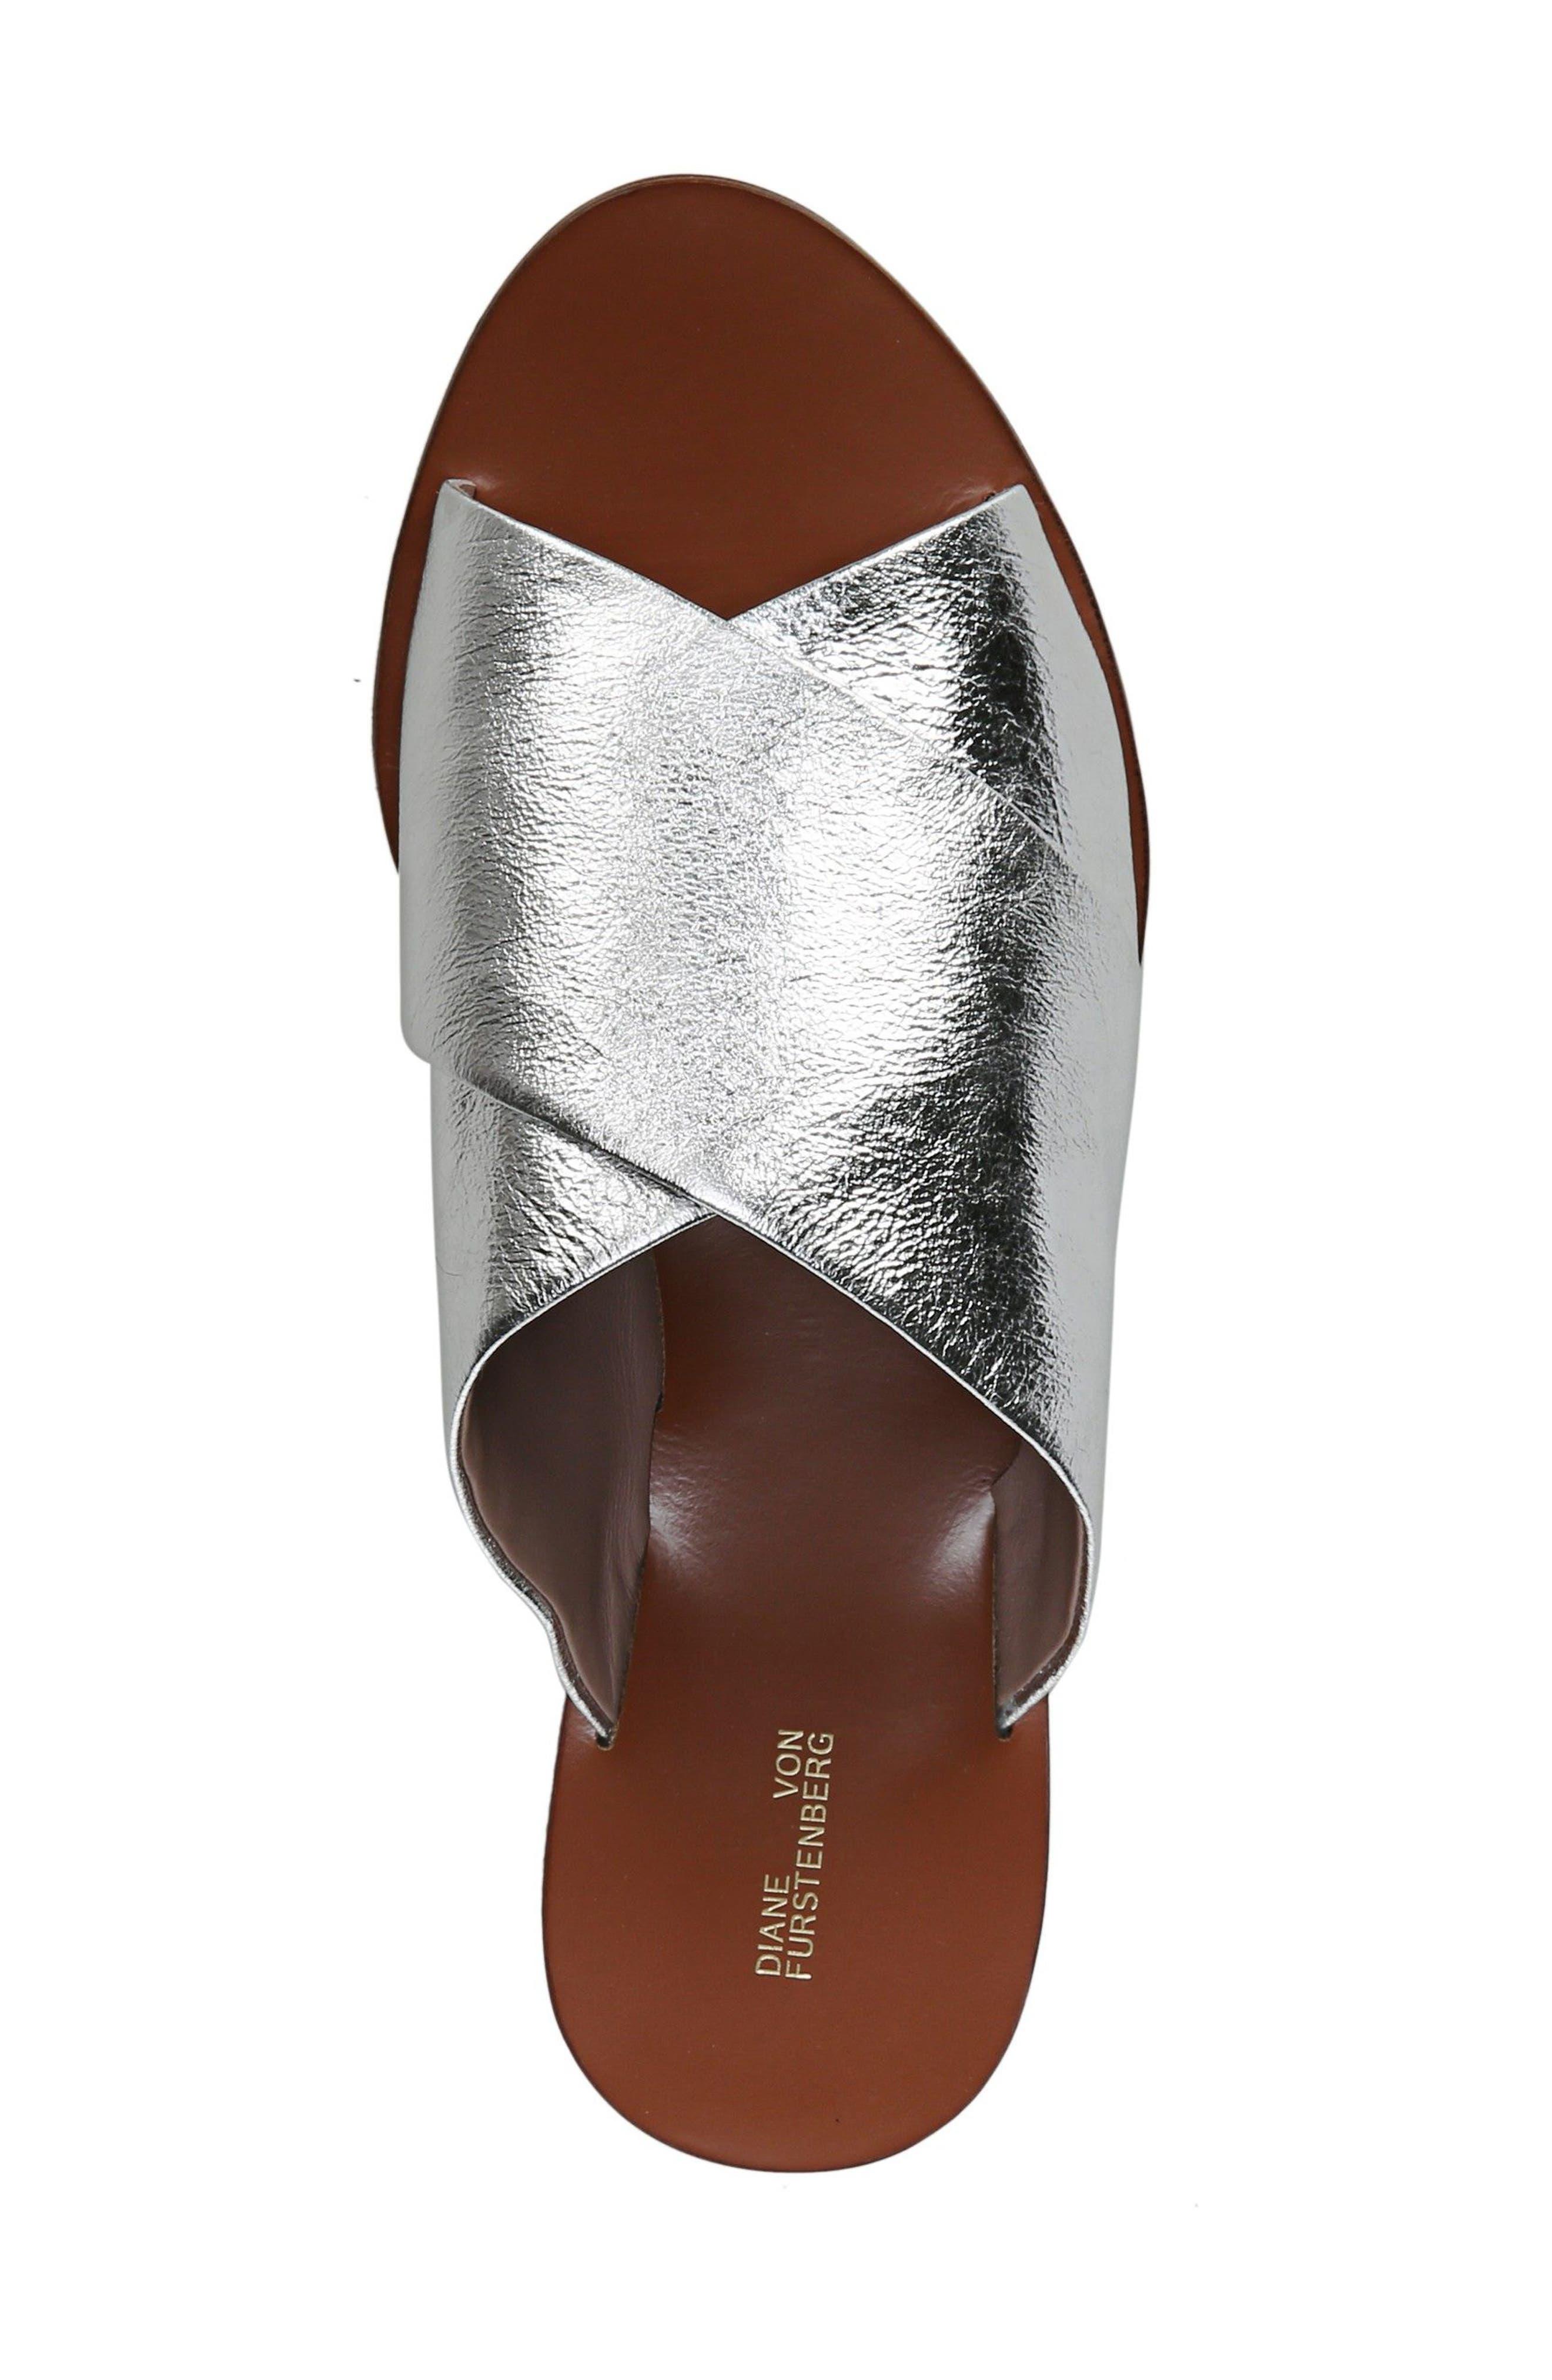 Bailie Sandal,                             Alternate thumbnail 6, color,                             Silver Leather